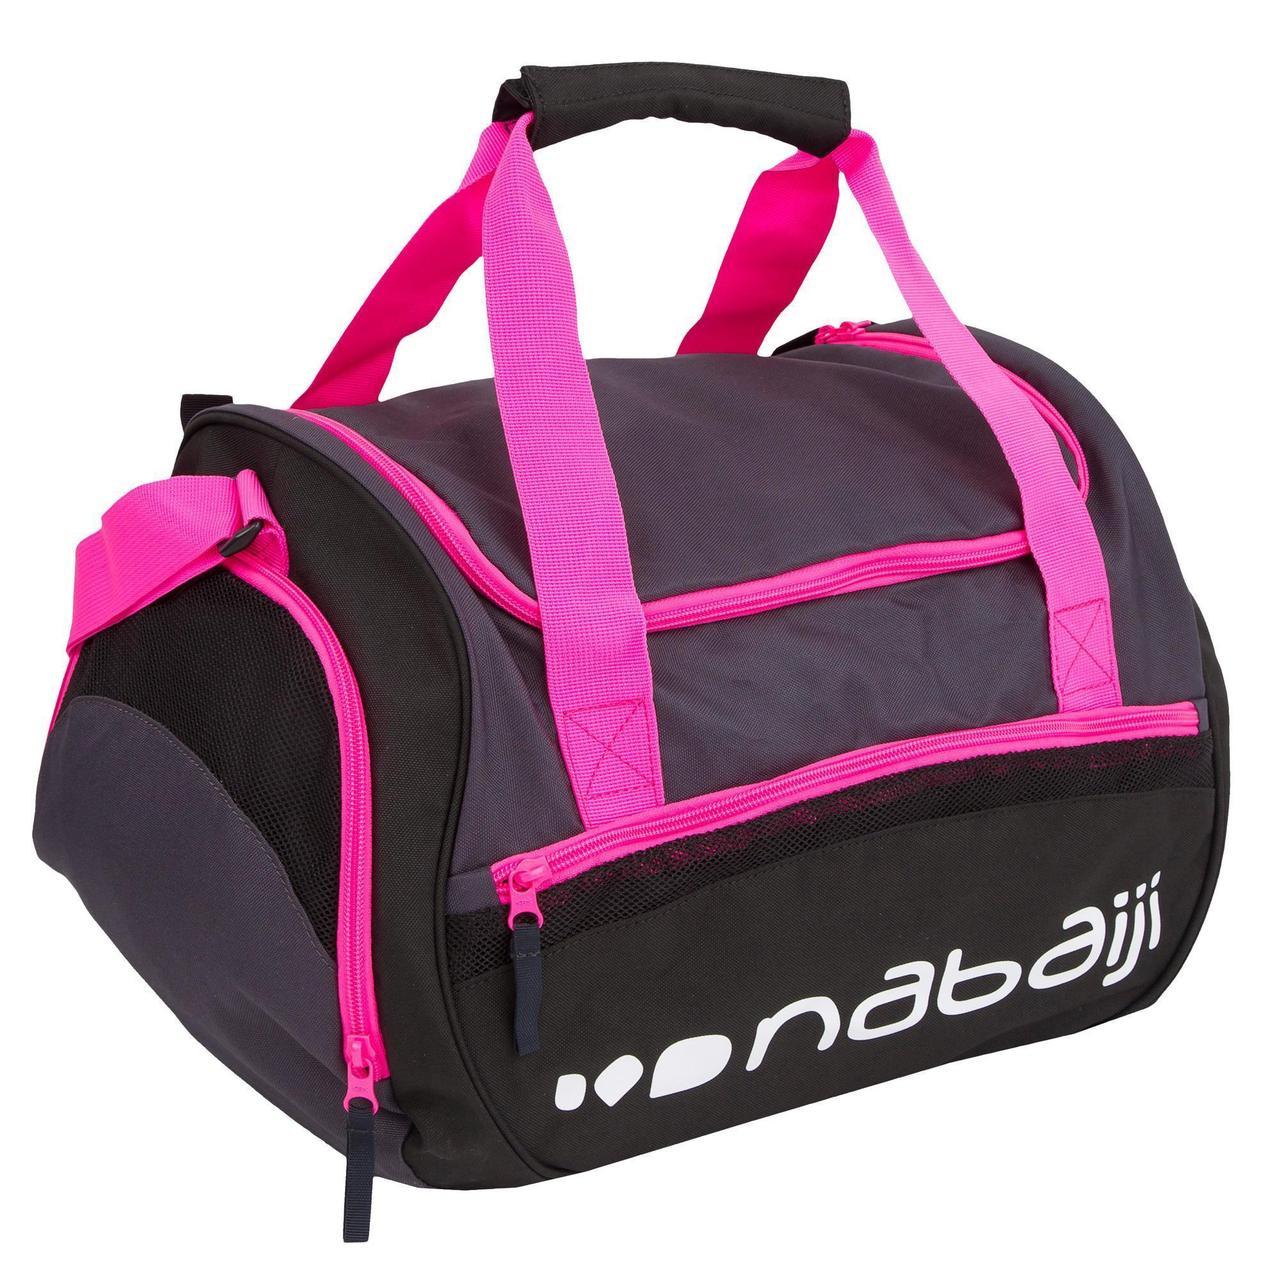 Сумка для плавания Nabaiji 500 30 L